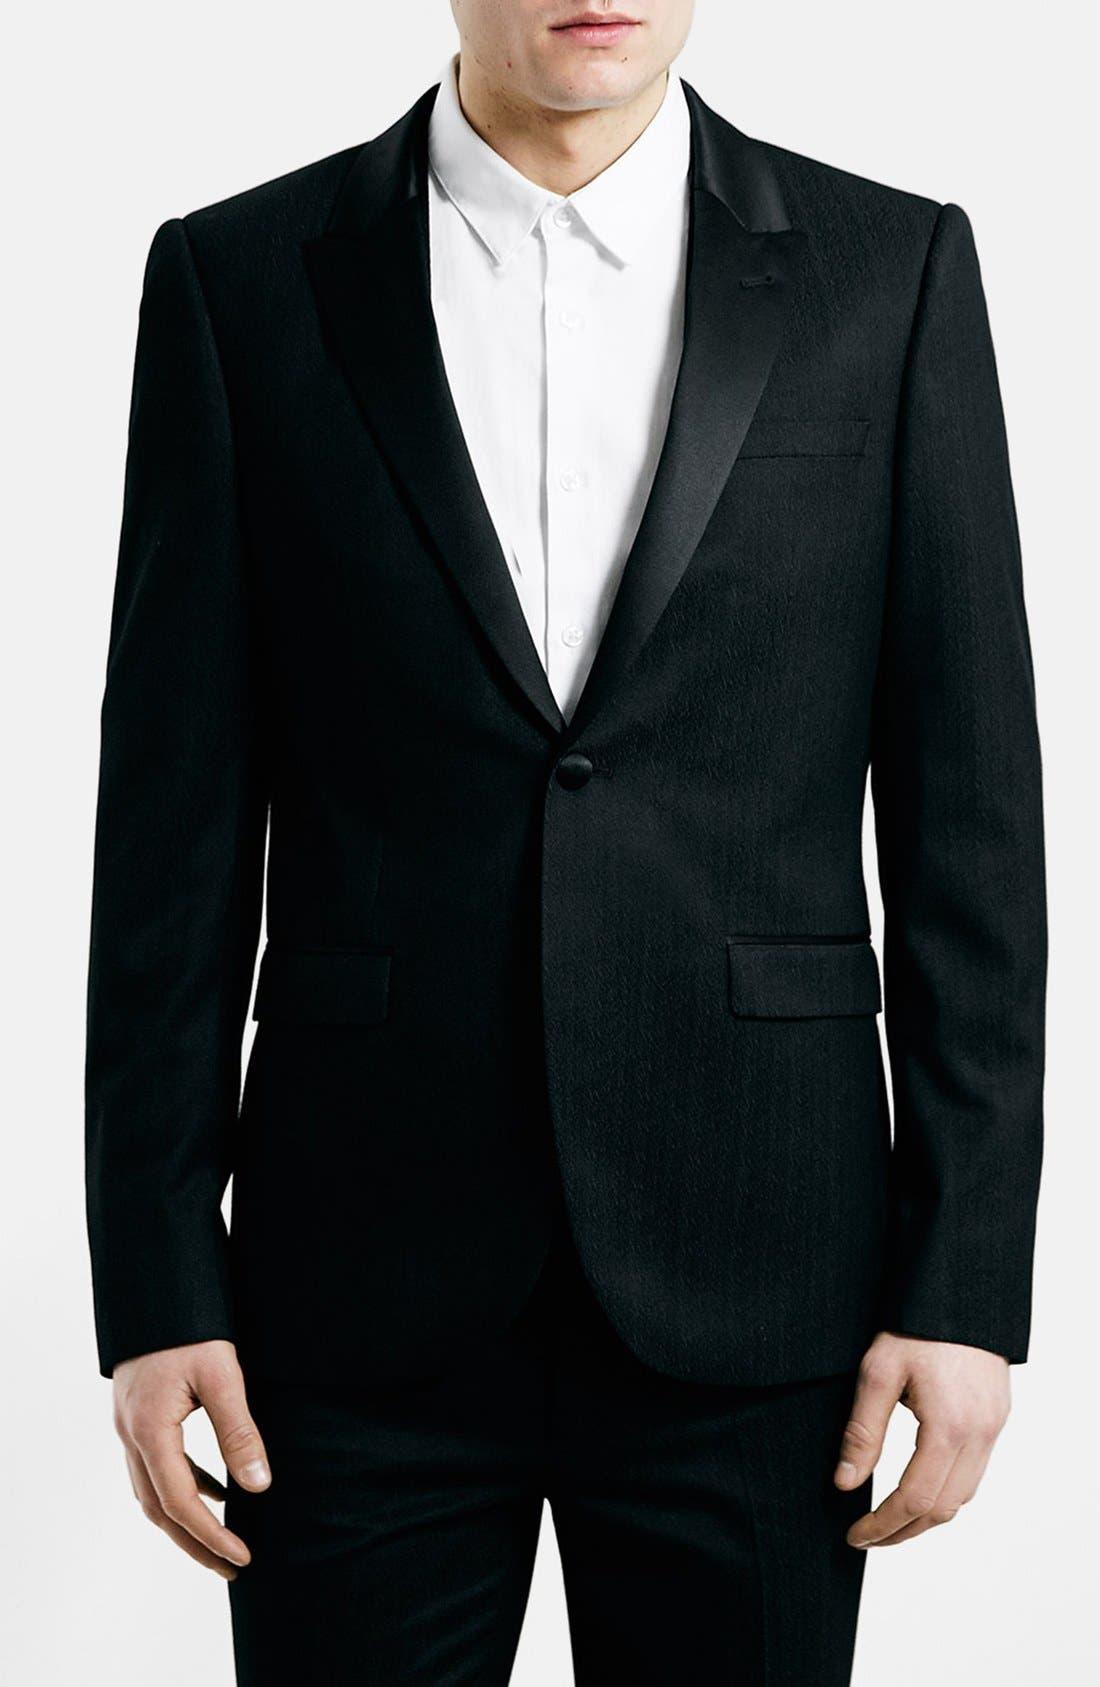 TOPMAN Black Textured Skinny Fit Tuxedo Jacket, Main, color, 001